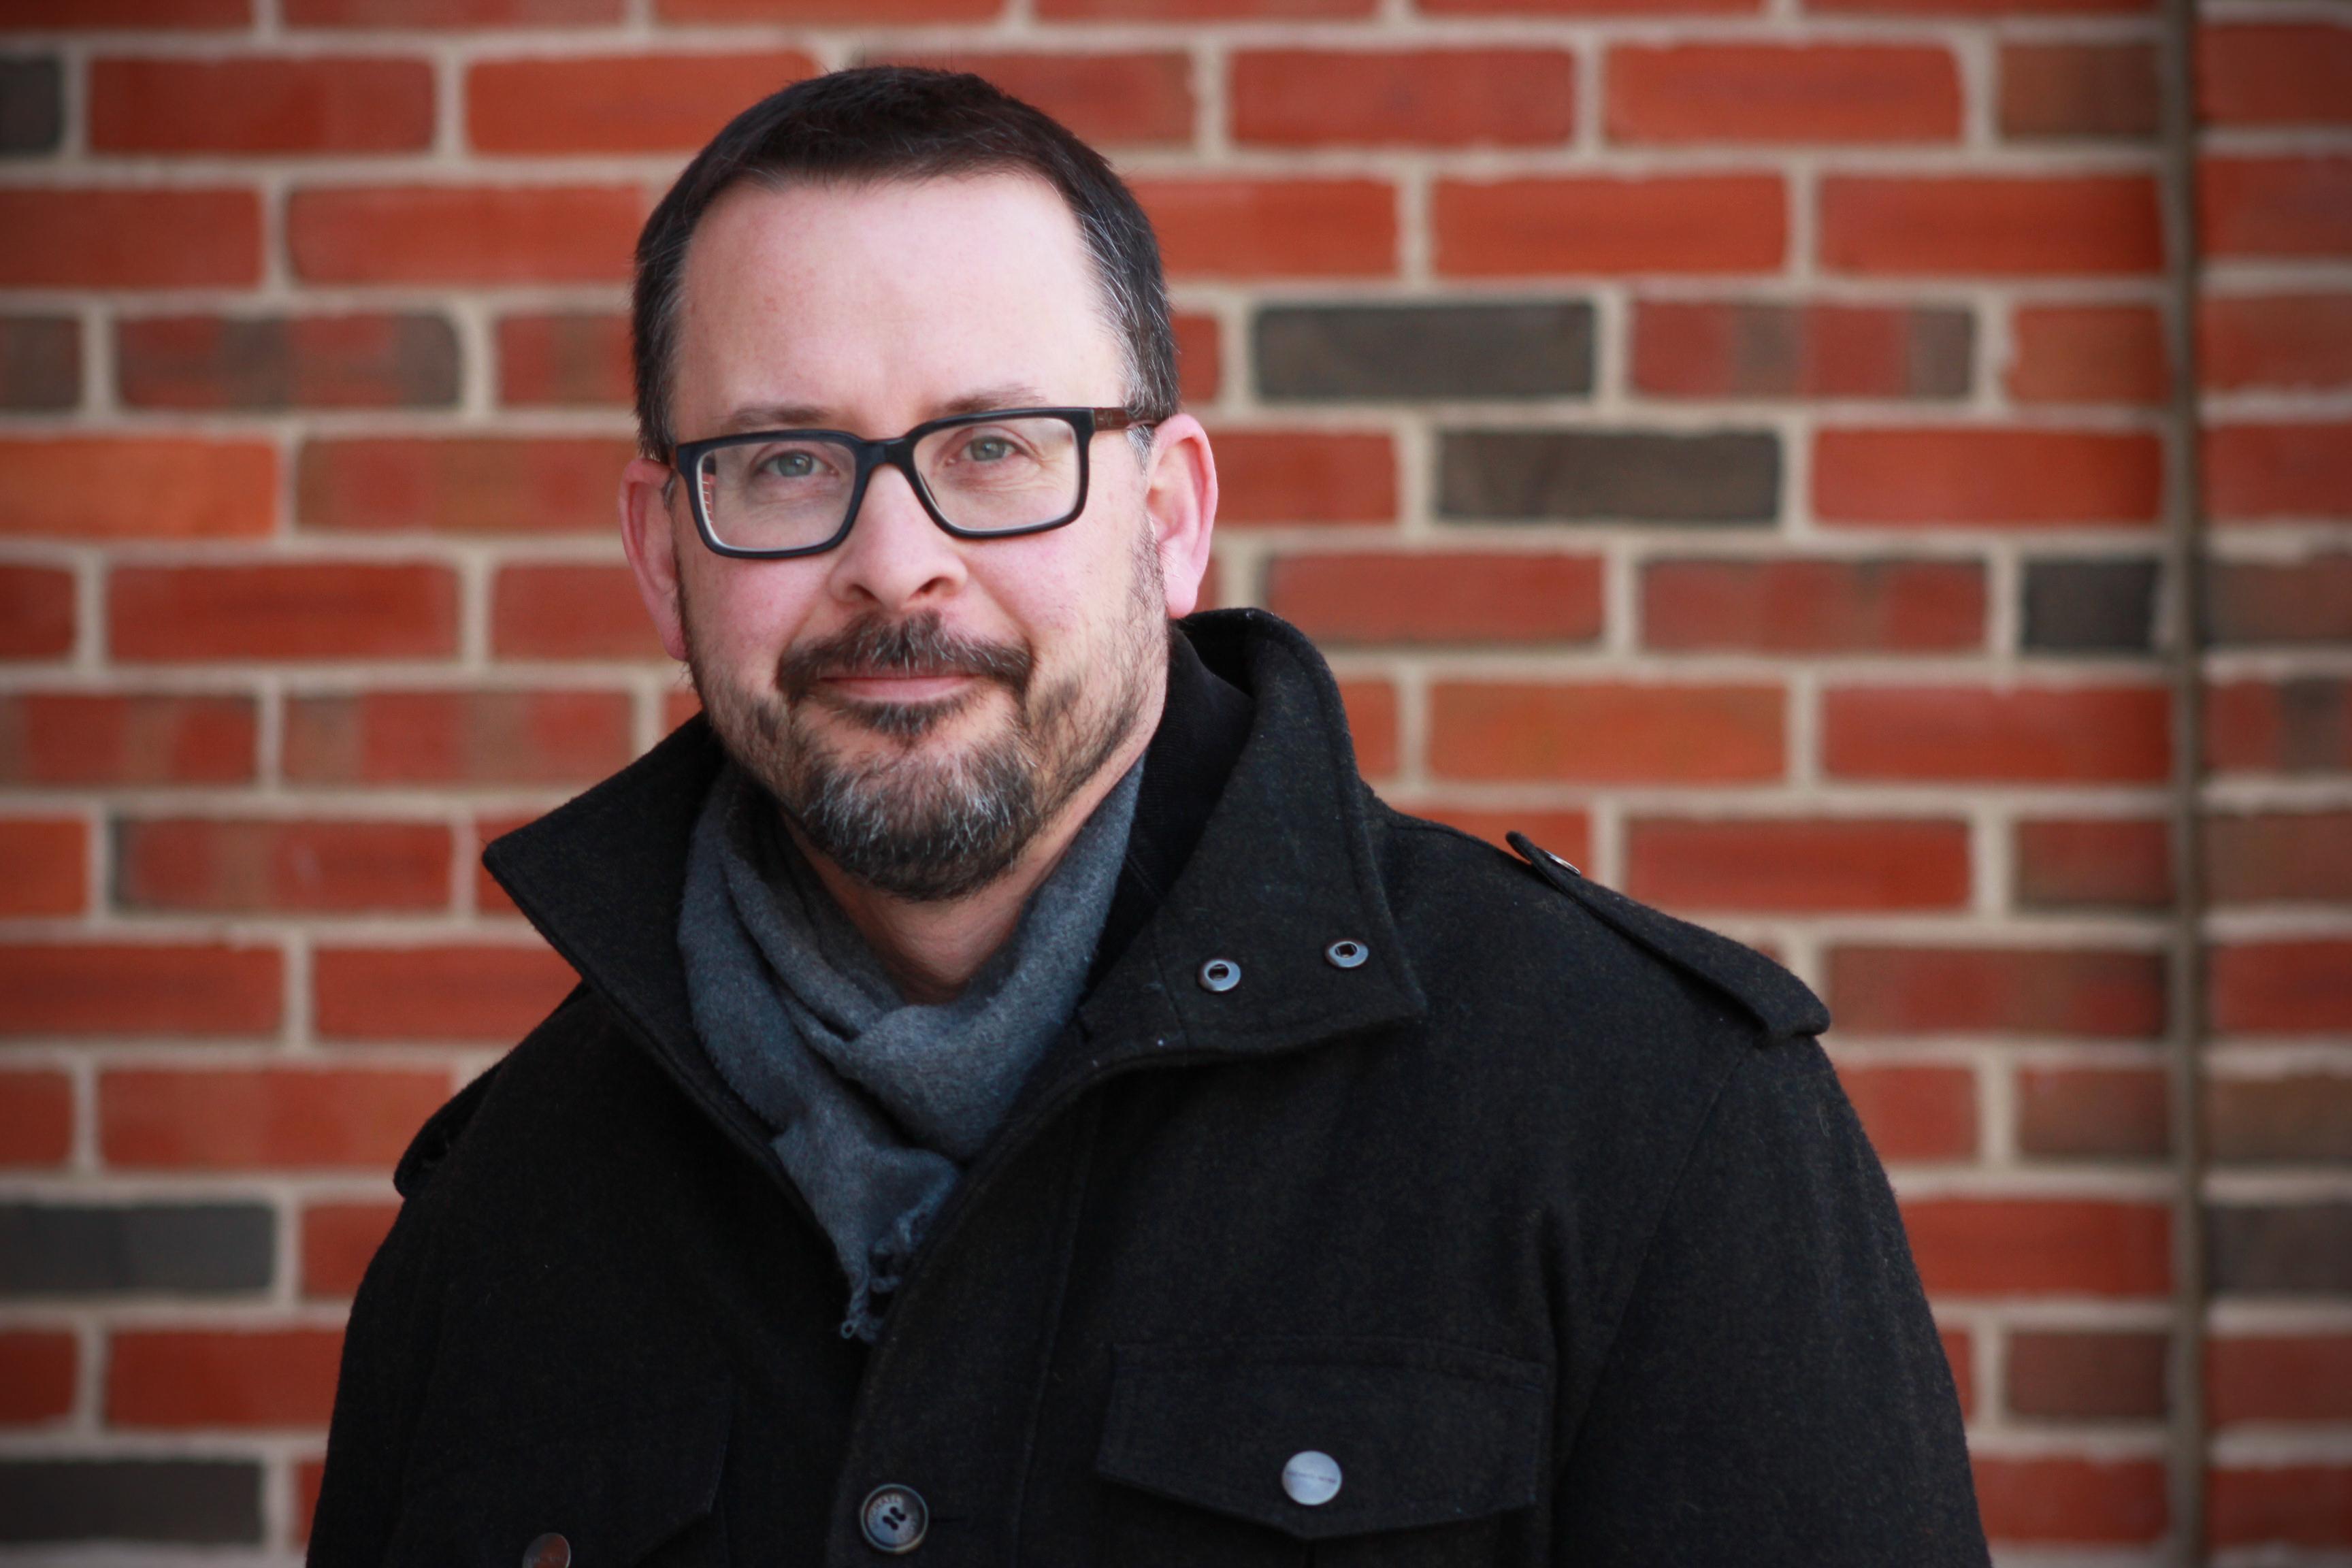 Dr. Matthew Roth